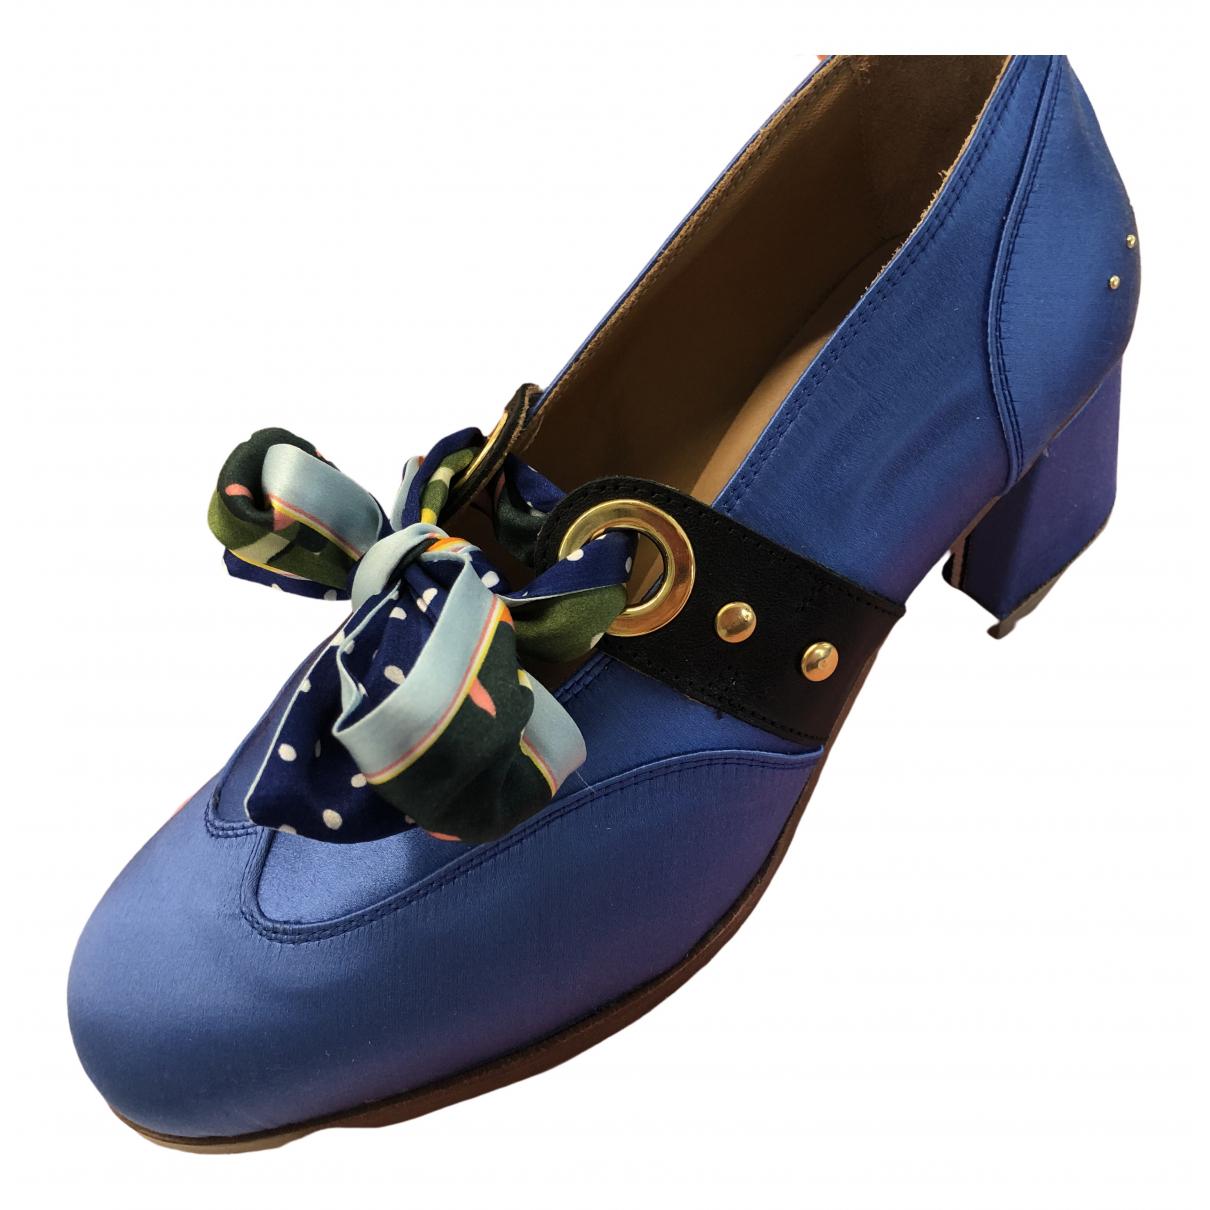 Tacones de Lona Lf Shoes